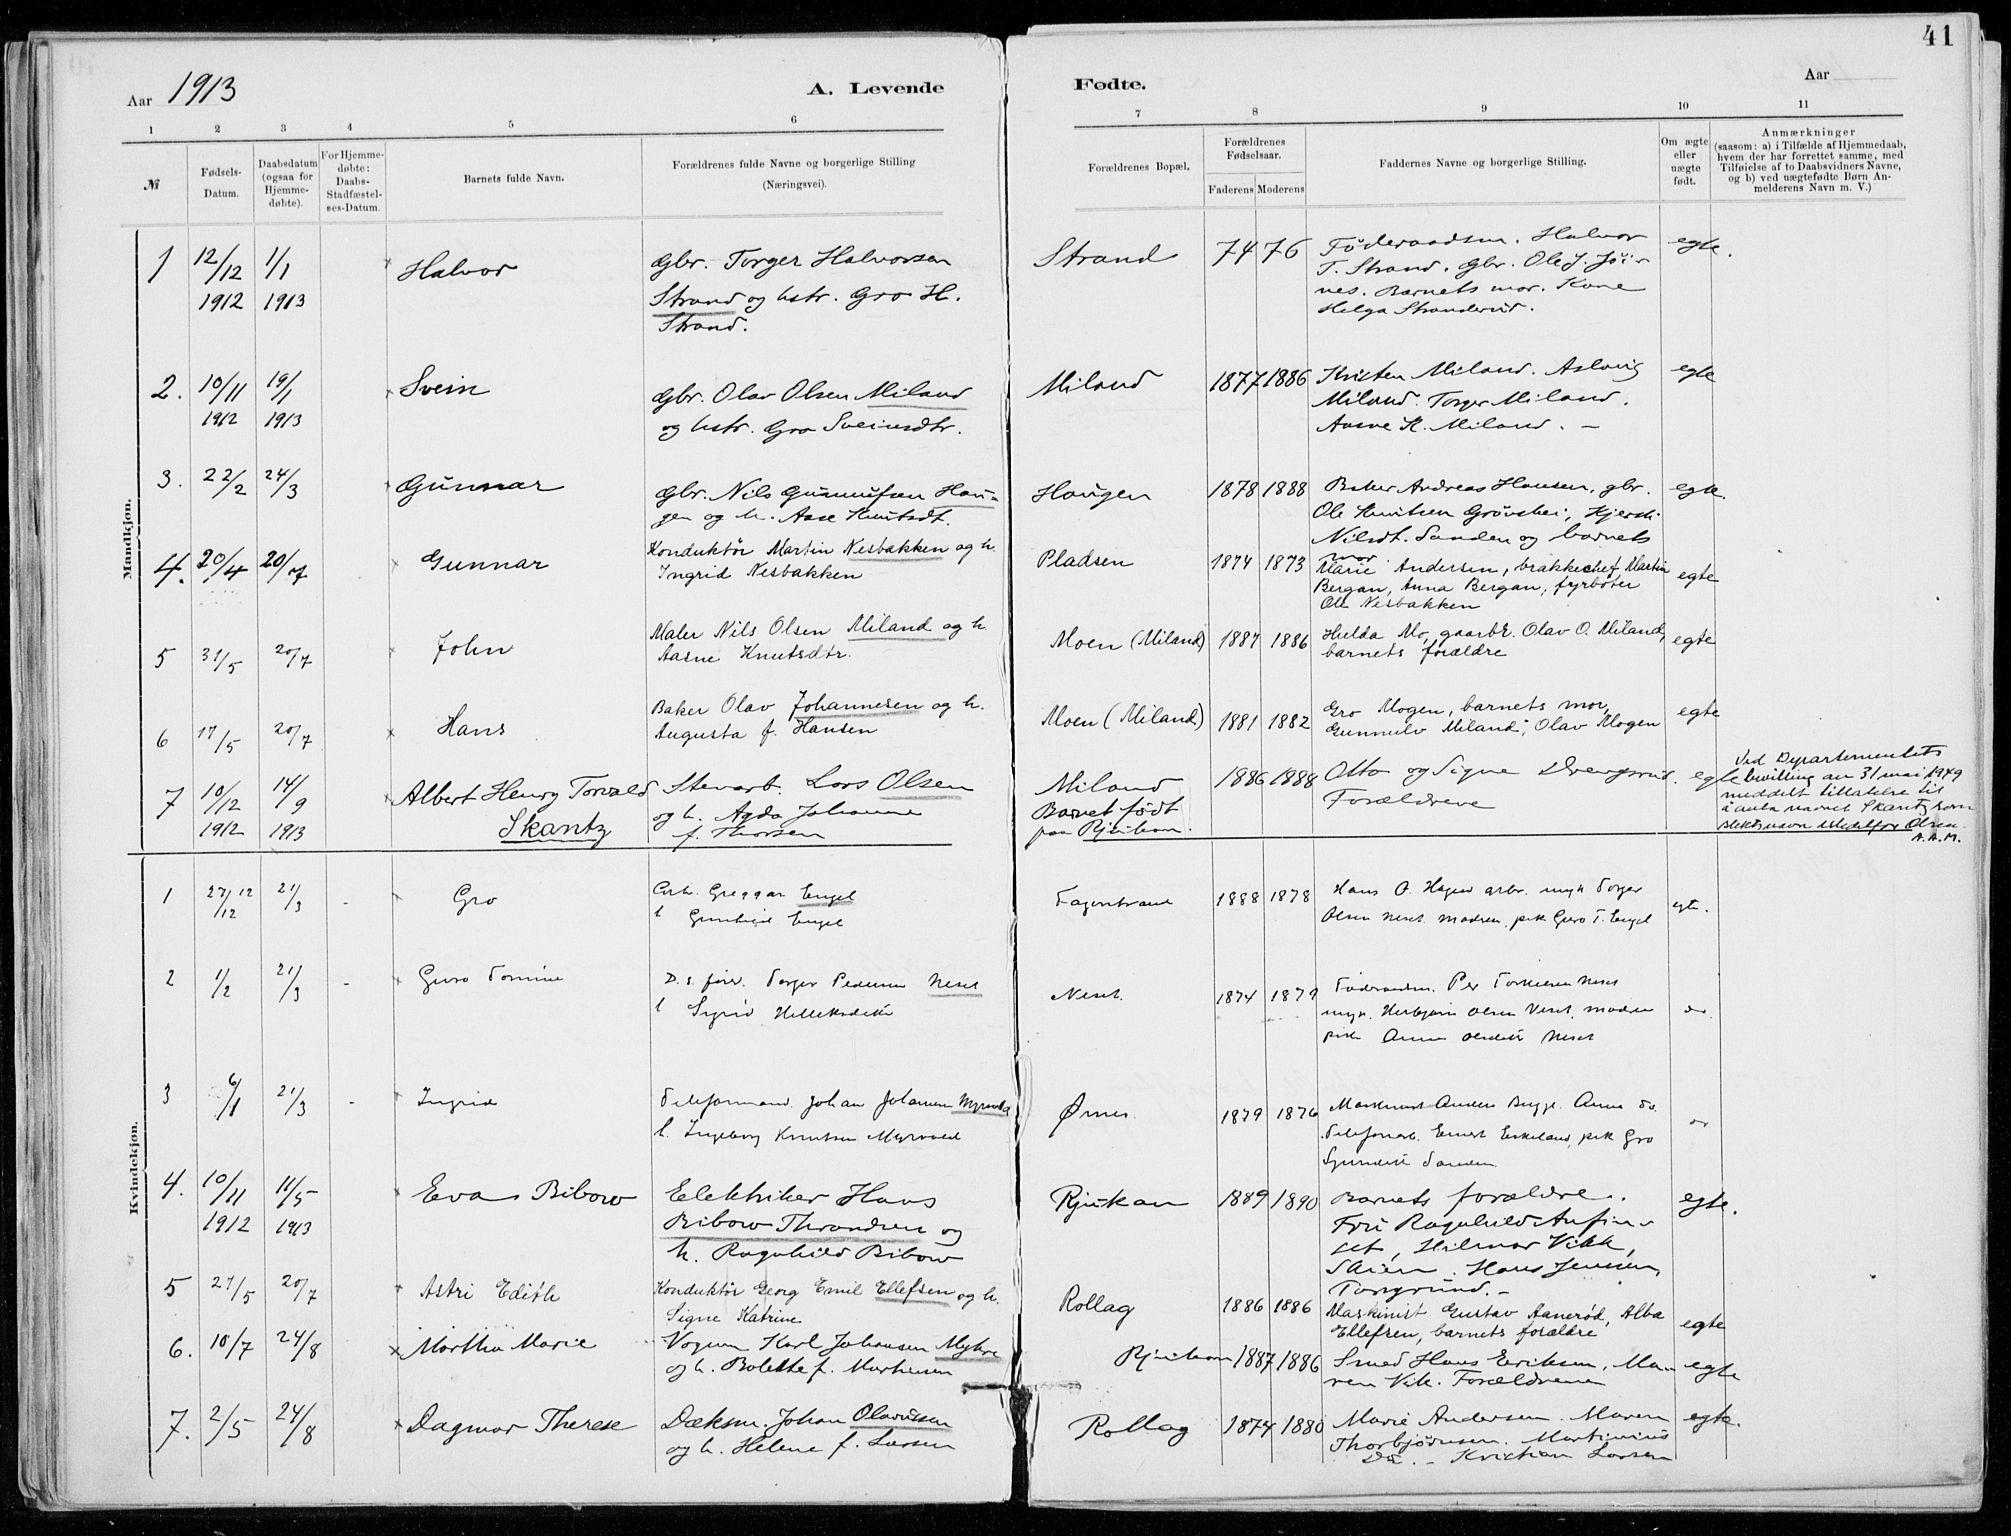 SAKO, Tinn kirkebøker, F/Fb/L0002: Ministerialbok nr. II 2, 1878-1917, s. 41